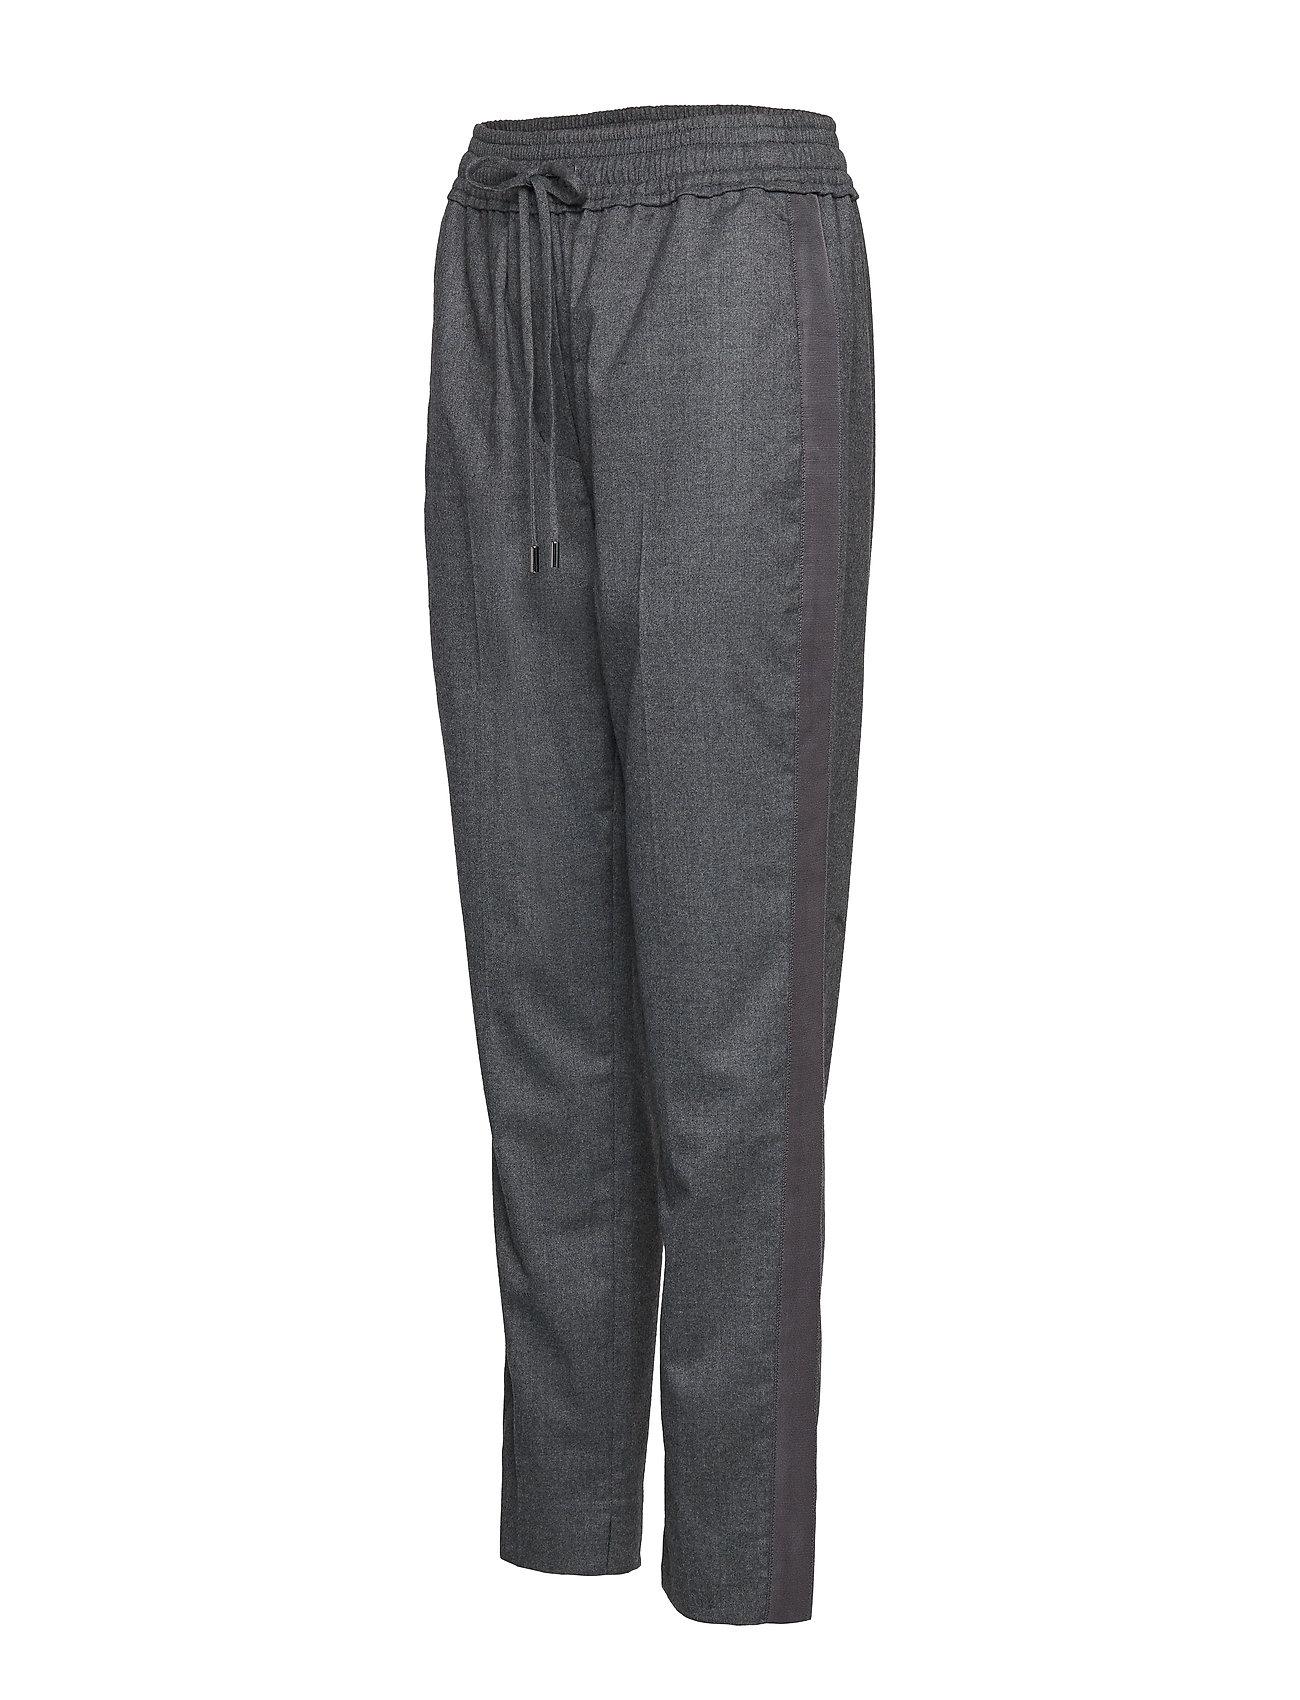 3.1 Phillip Lim Track Pant W Side Stripe (Medium Melange Grey), 1207.60